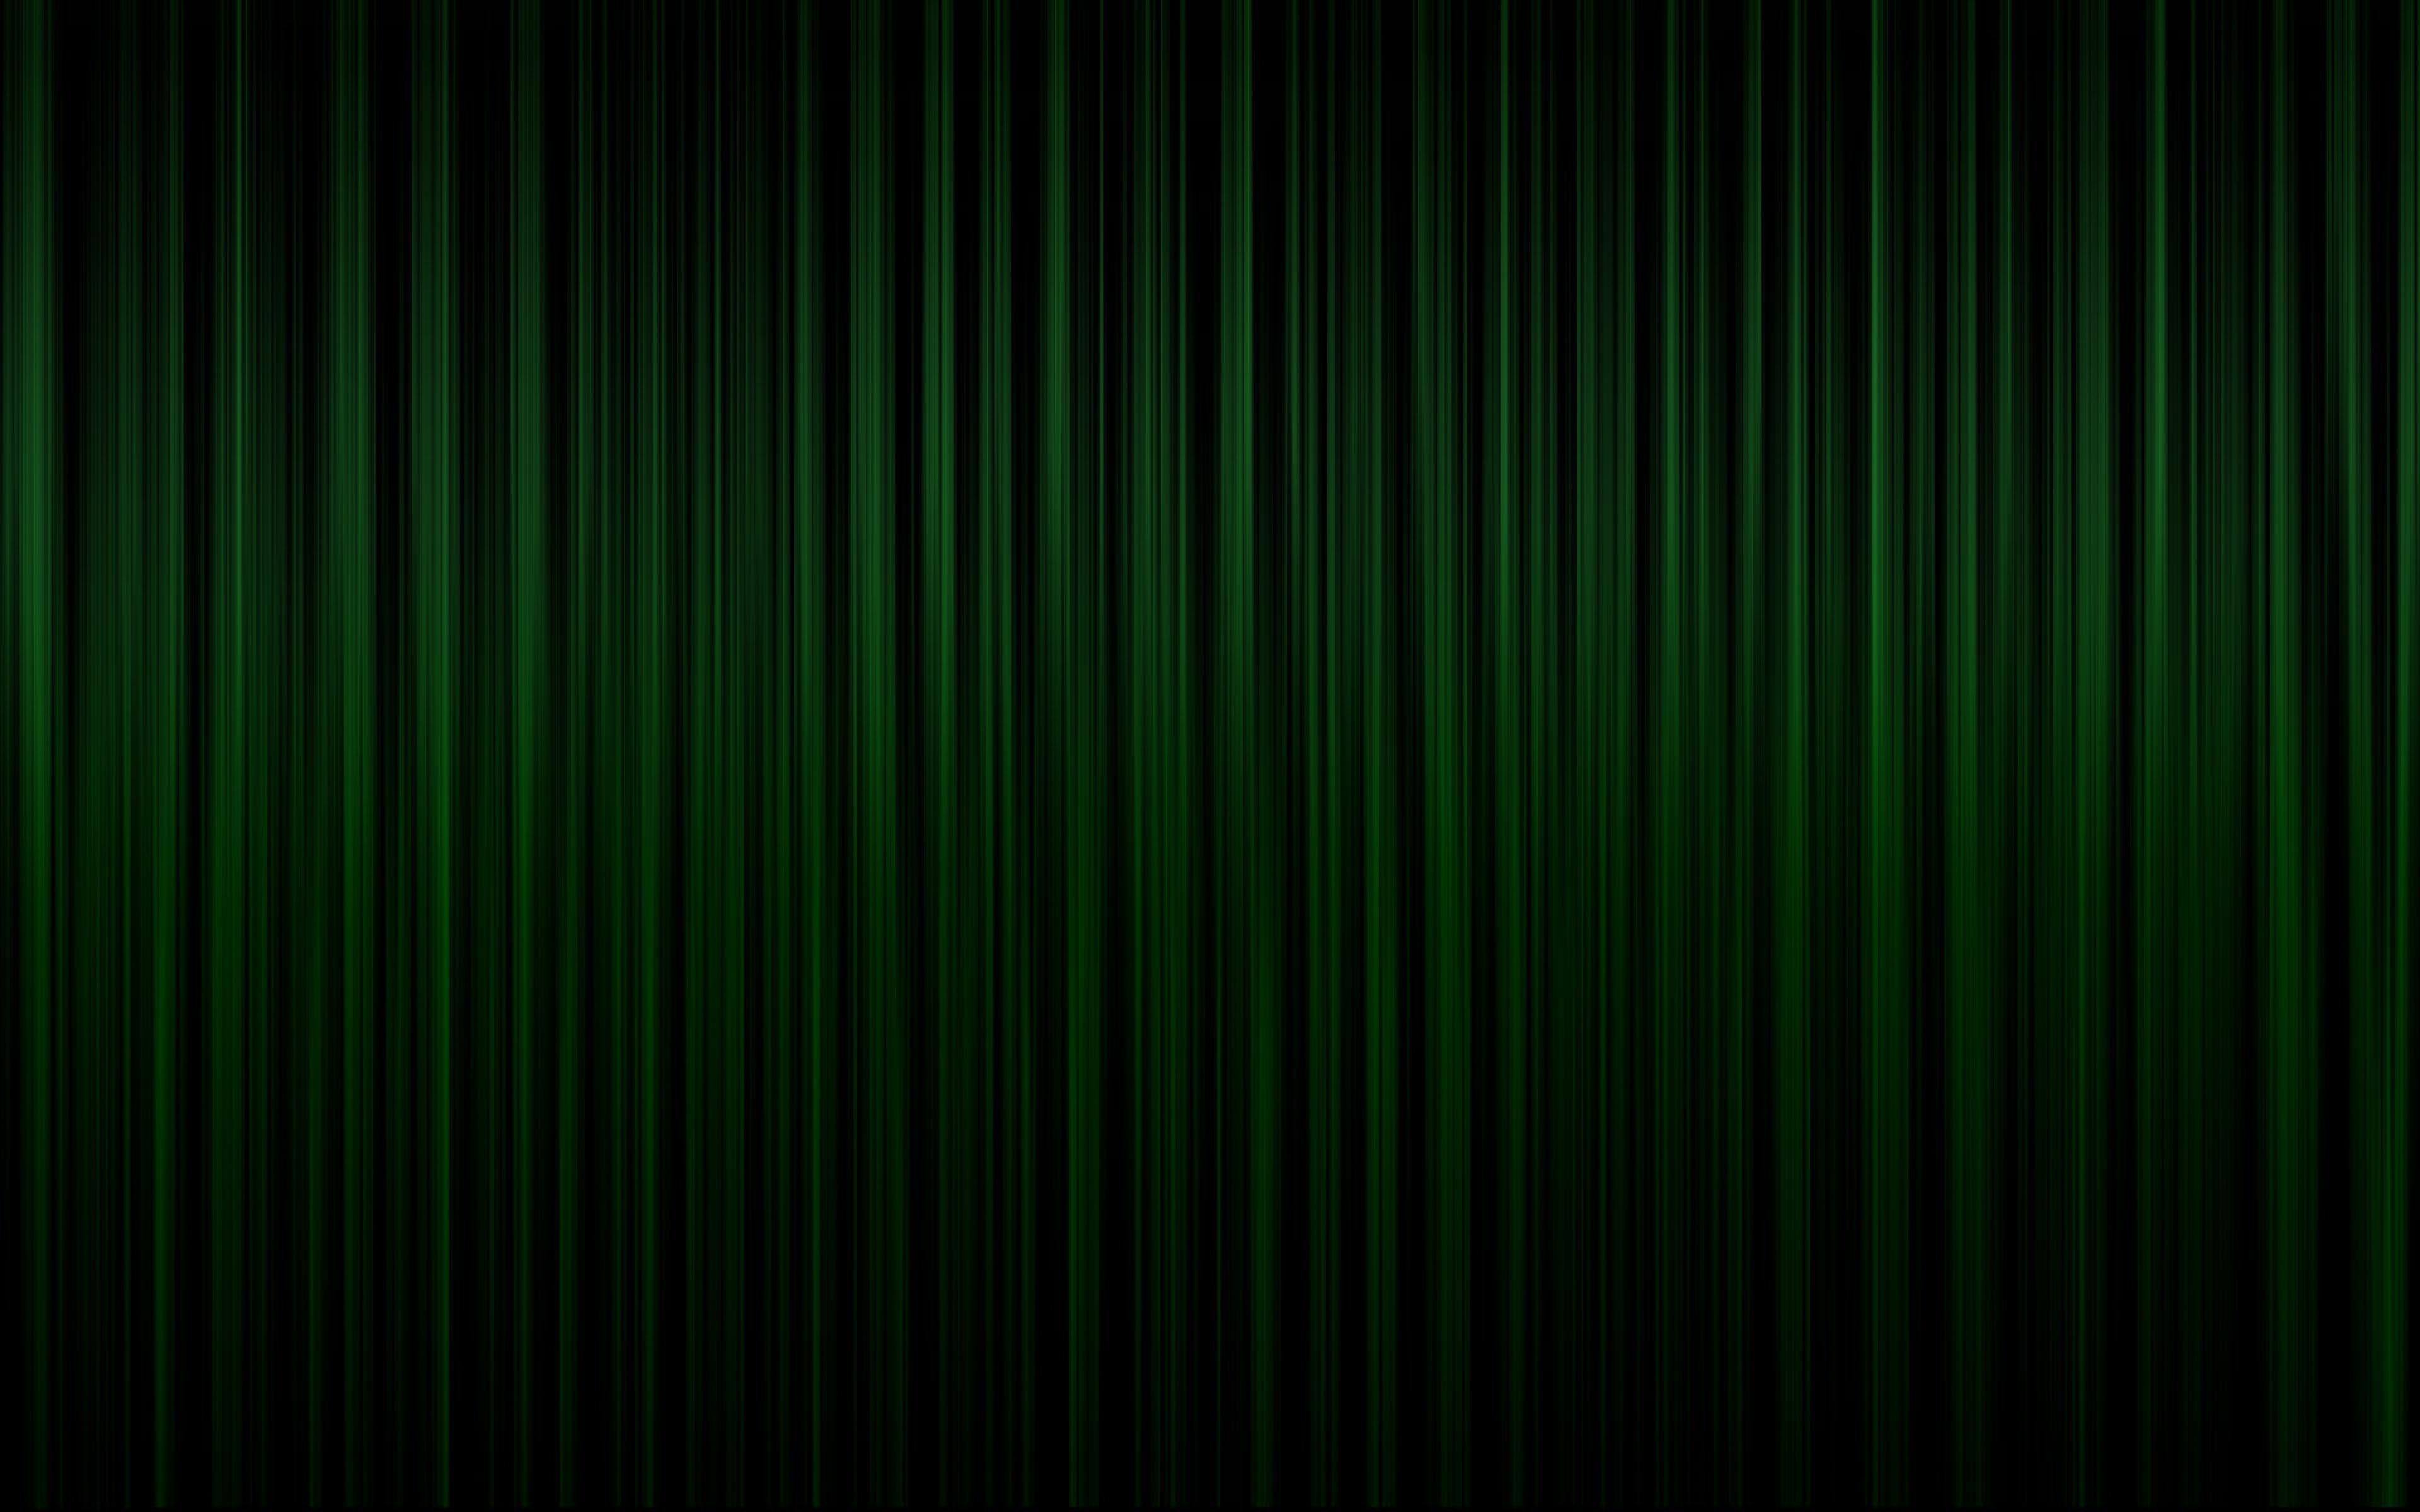 190 Vertical Wallpaper Hd: Vertical 4K Wallpapers